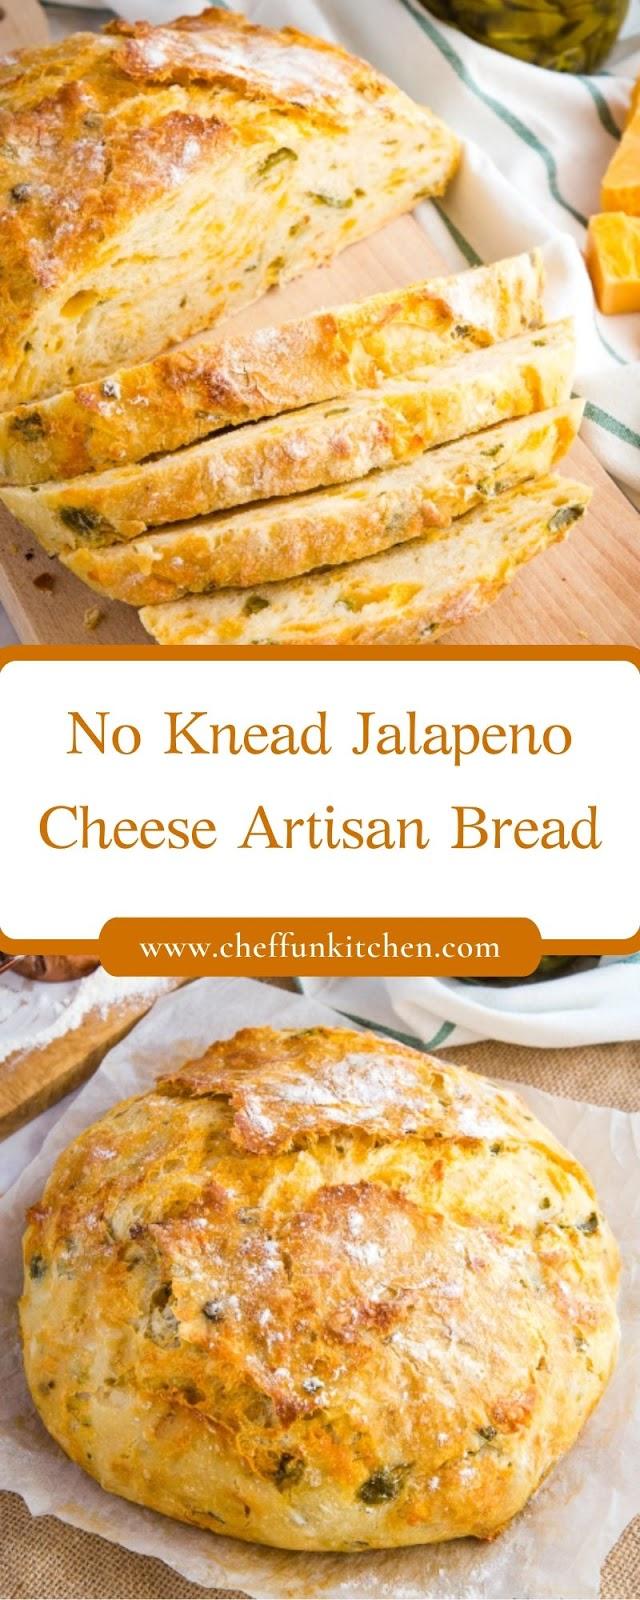 No Knead Jalapeno Cheese Artisan Bread